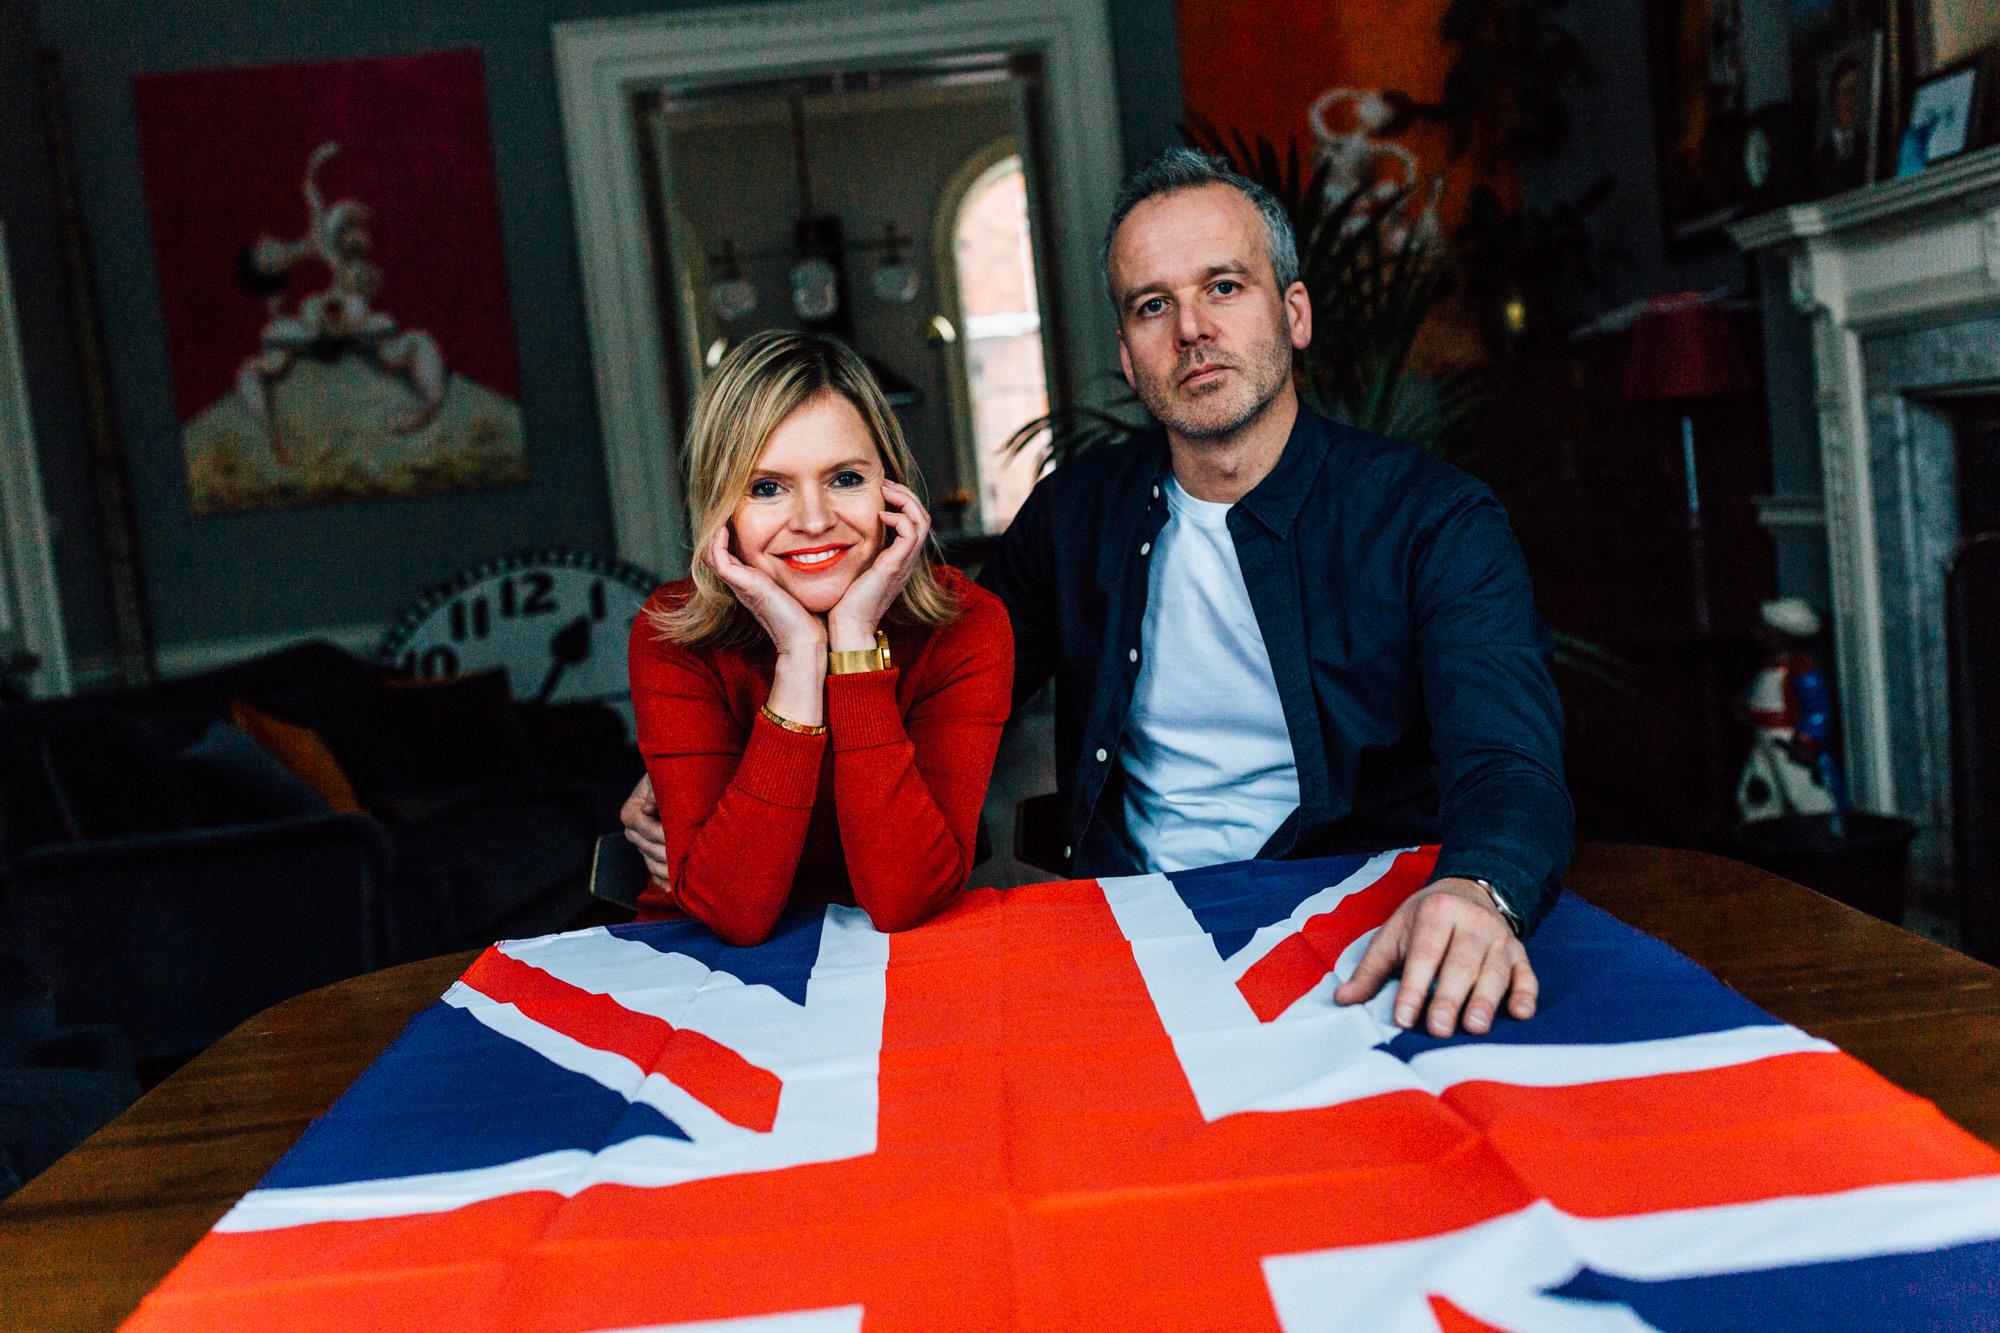 Newgate Watches Founders Jim & Chloe Read